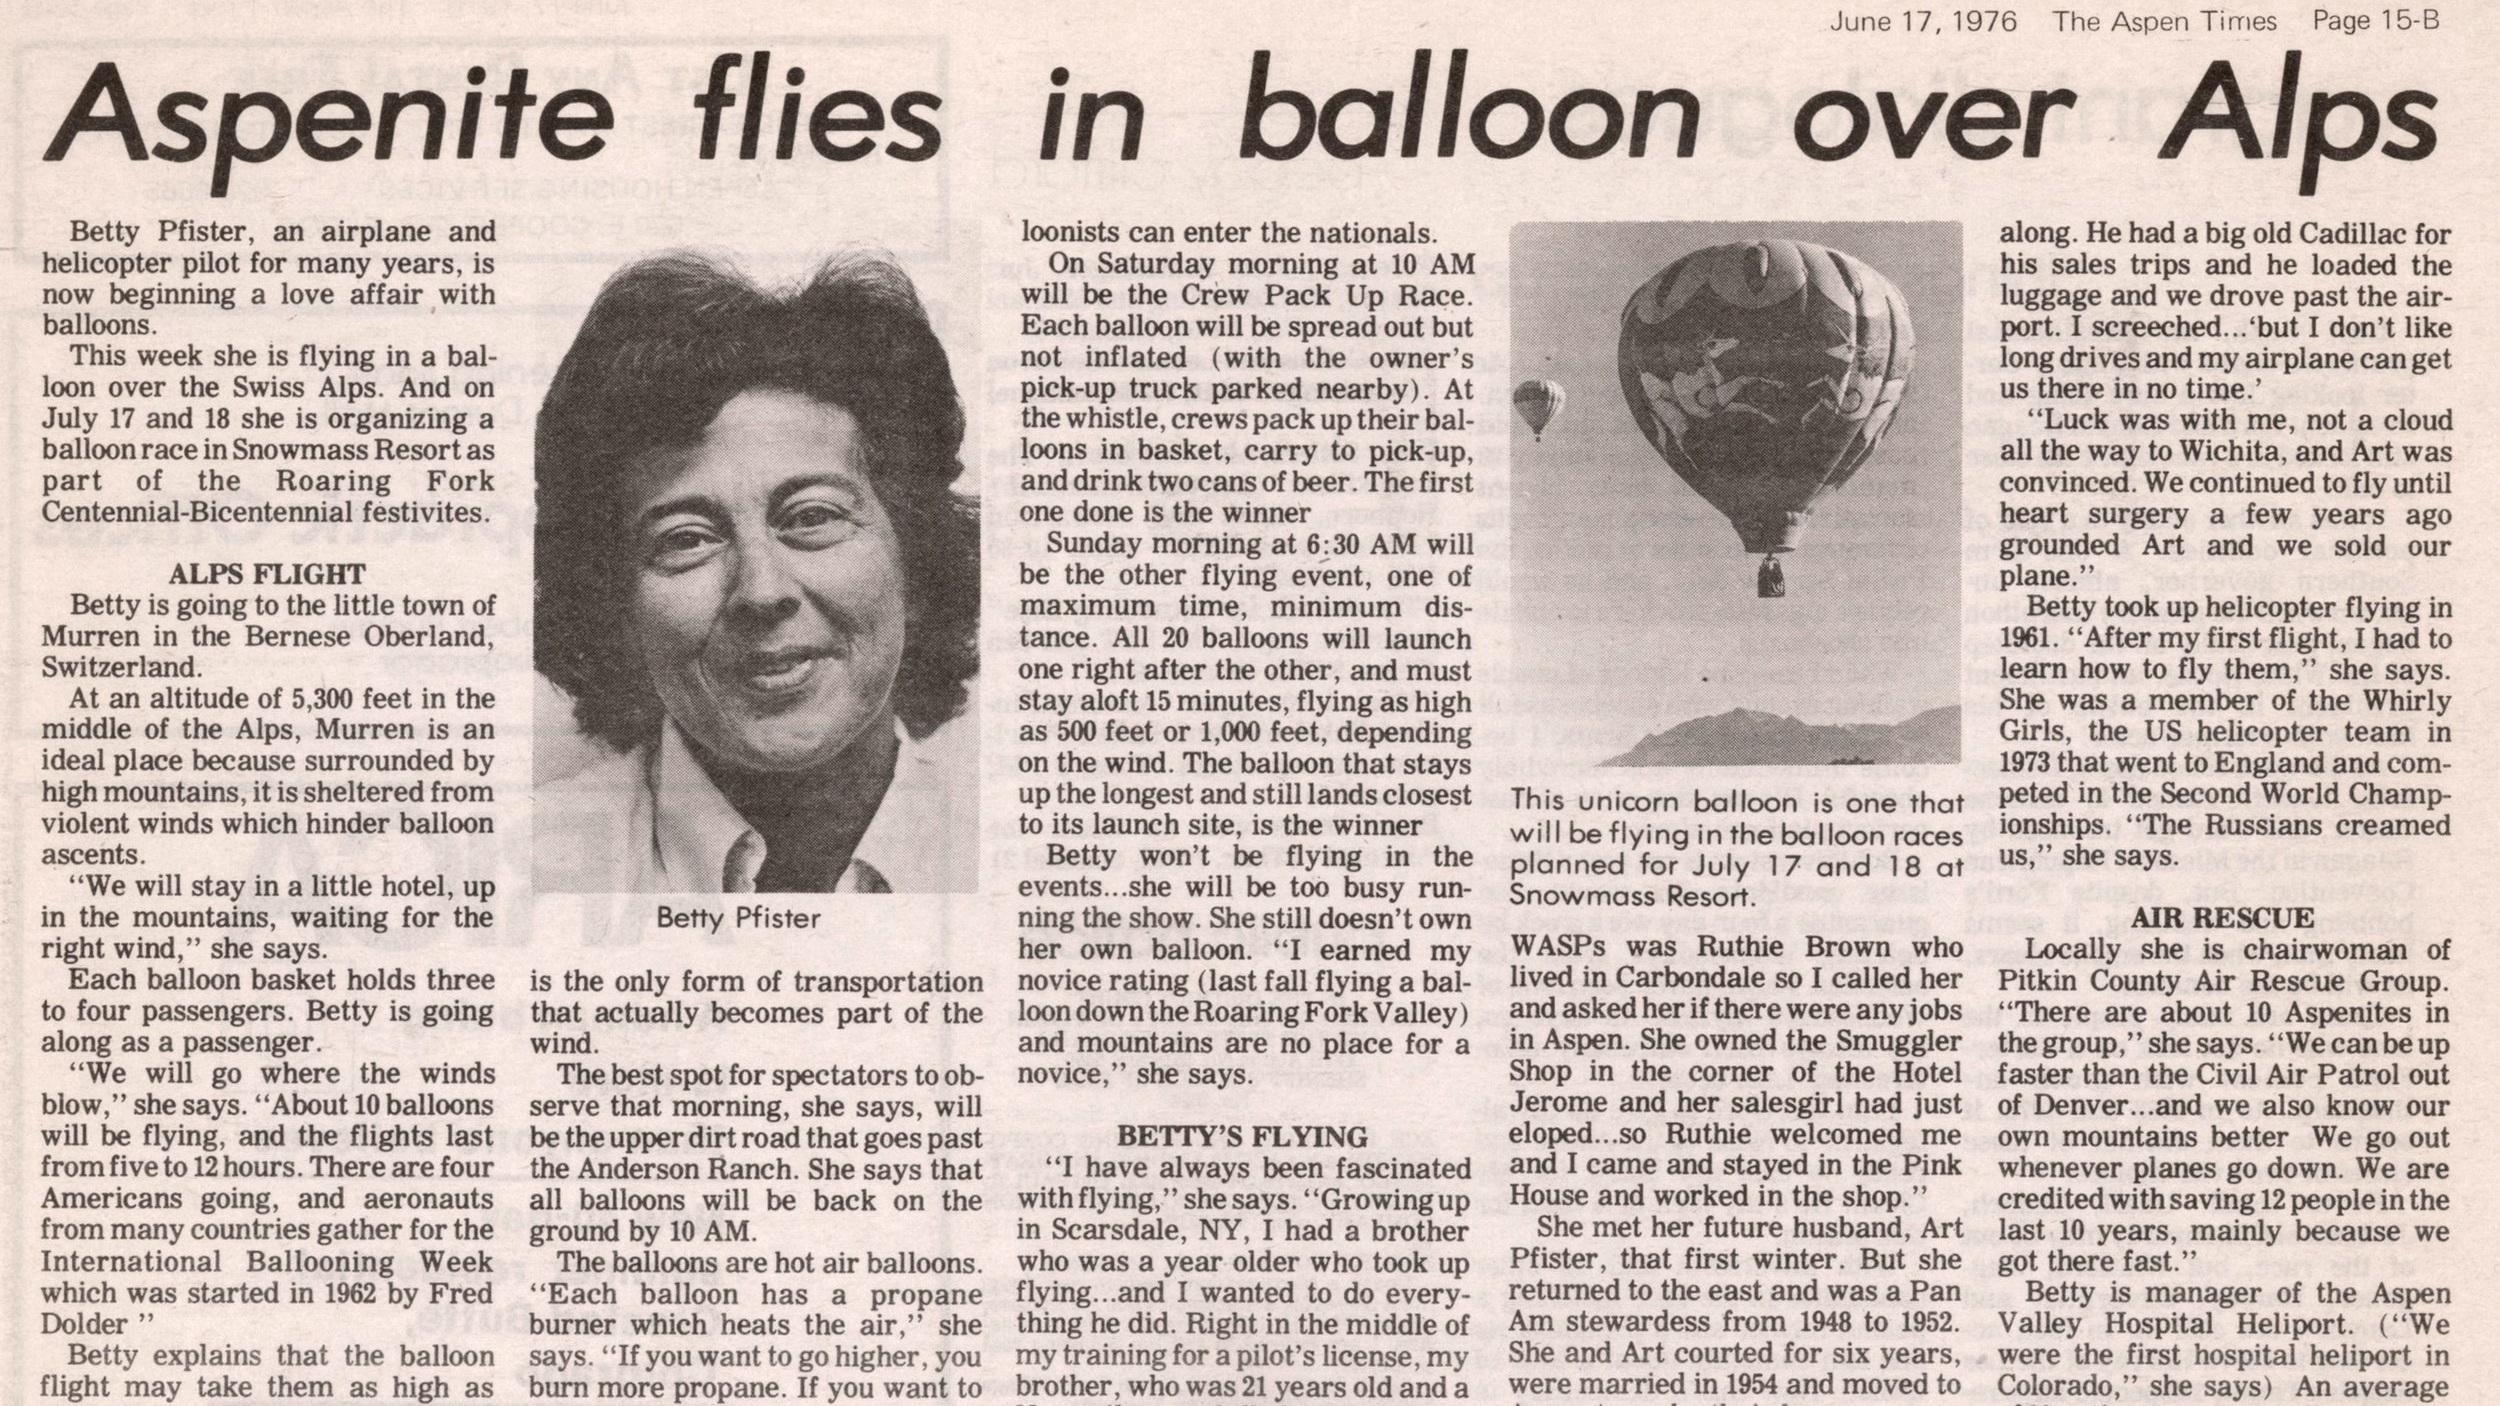 Aspenite flies balloon over Alps